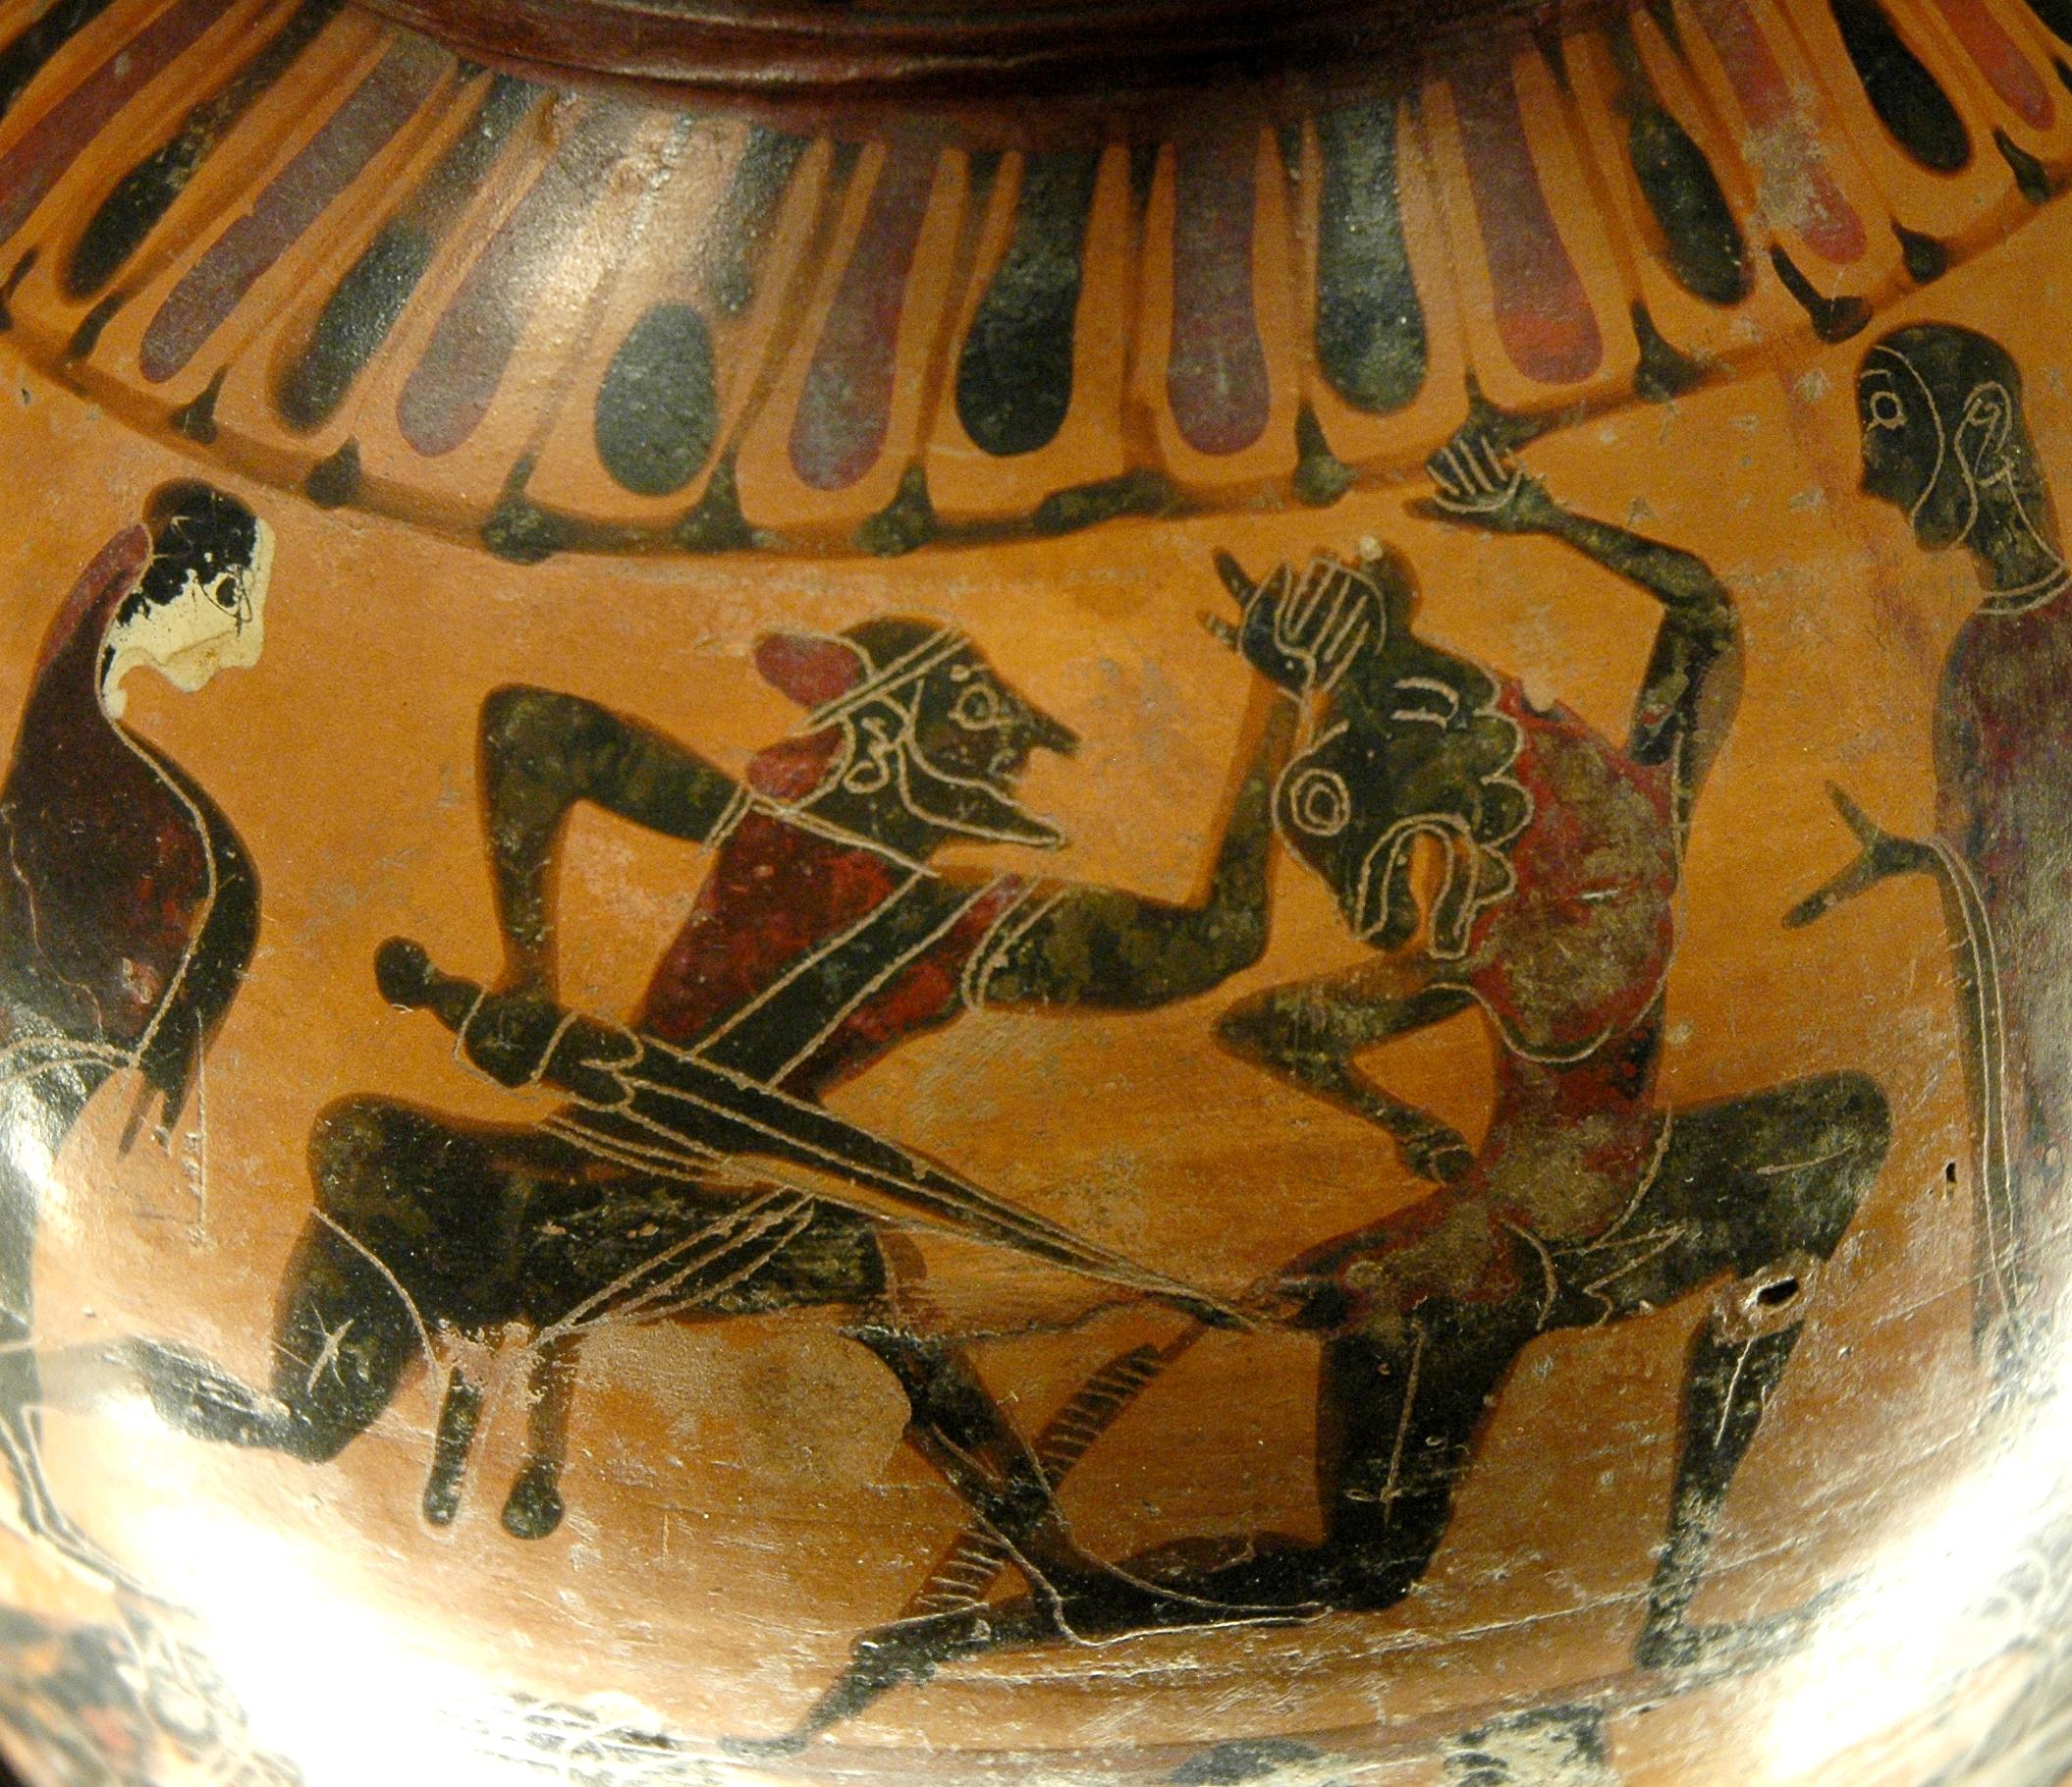 https://upload.wikimedia.org/wikipedia/commons/d/d6/Theseus_Castellani_Louvre_E850.jpg